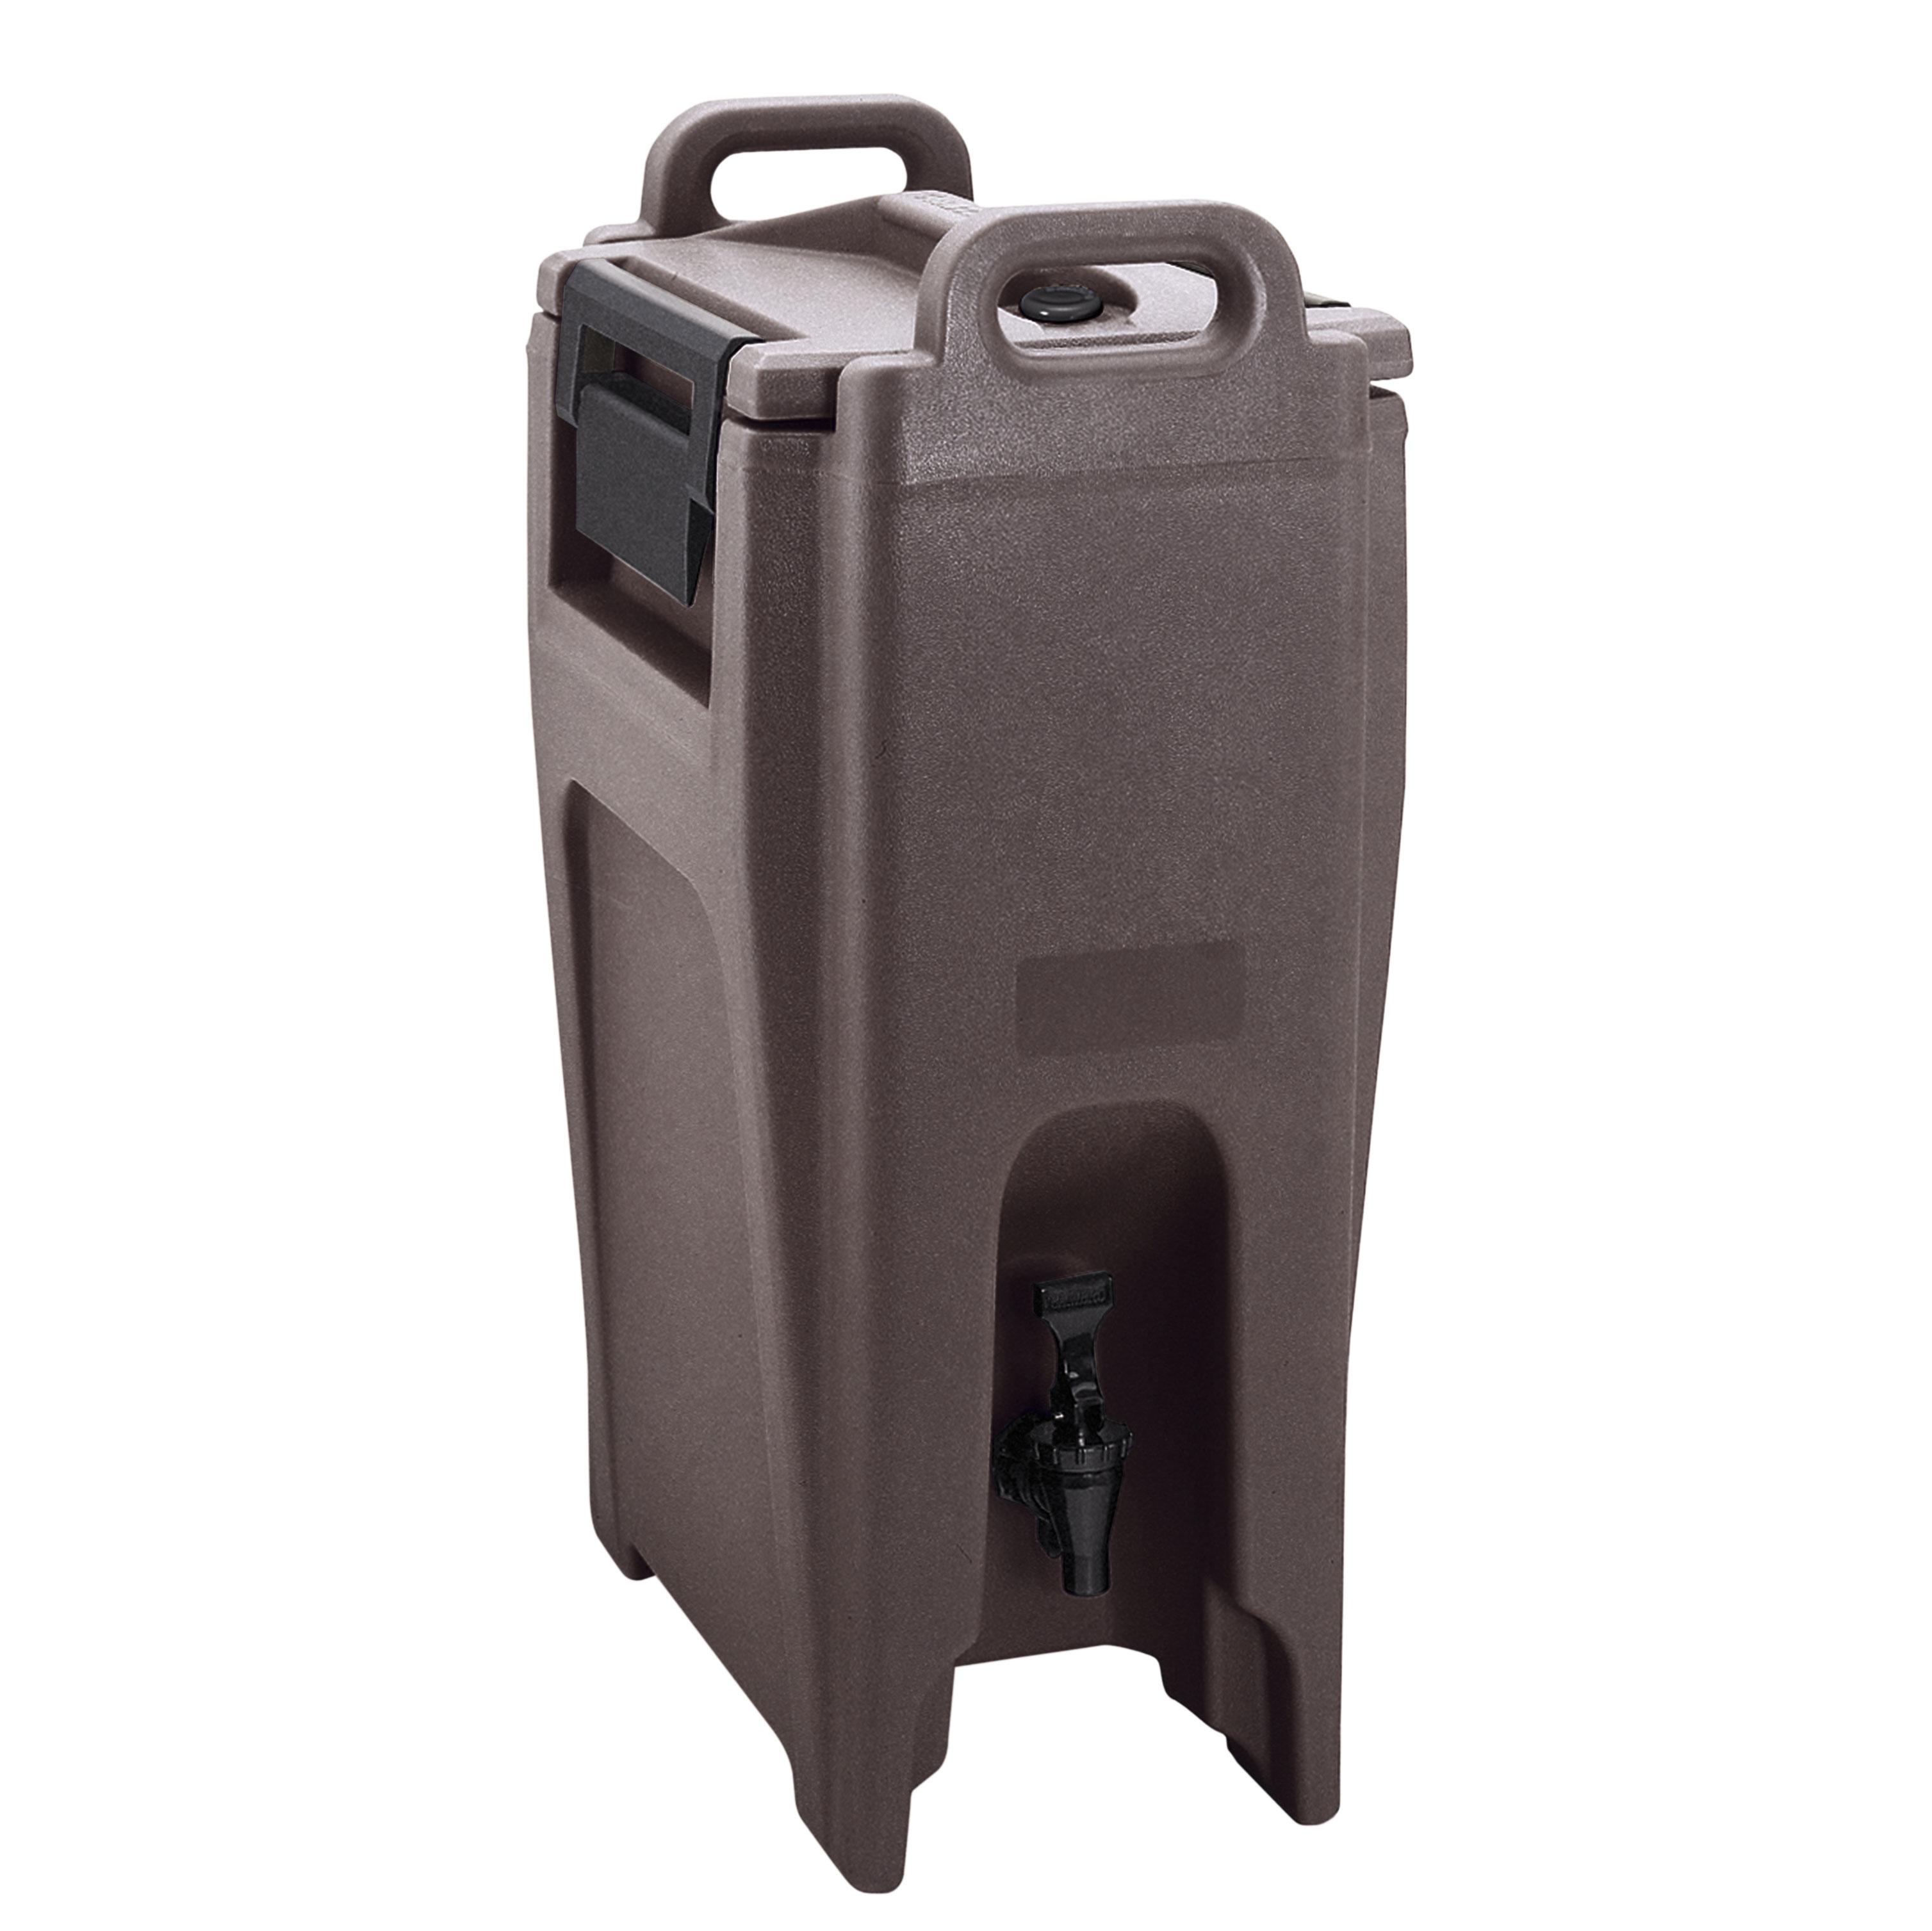 Cambro UC500194 beverage dispensers